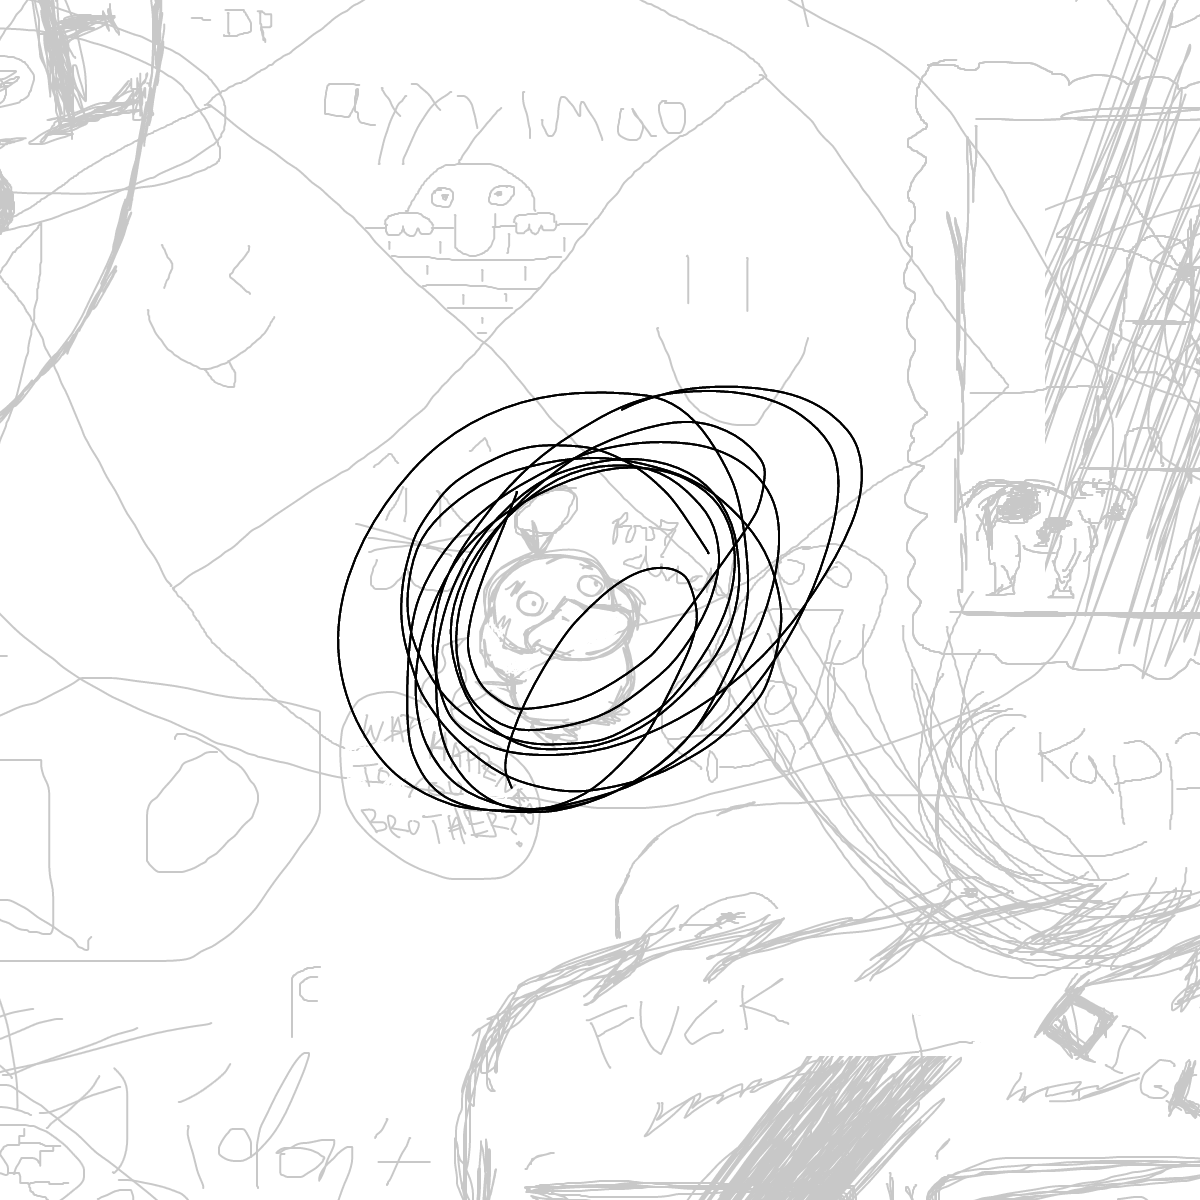 BAAAM drawing#23526 lat:52.4752807617187500lng: 13.4069042205810550